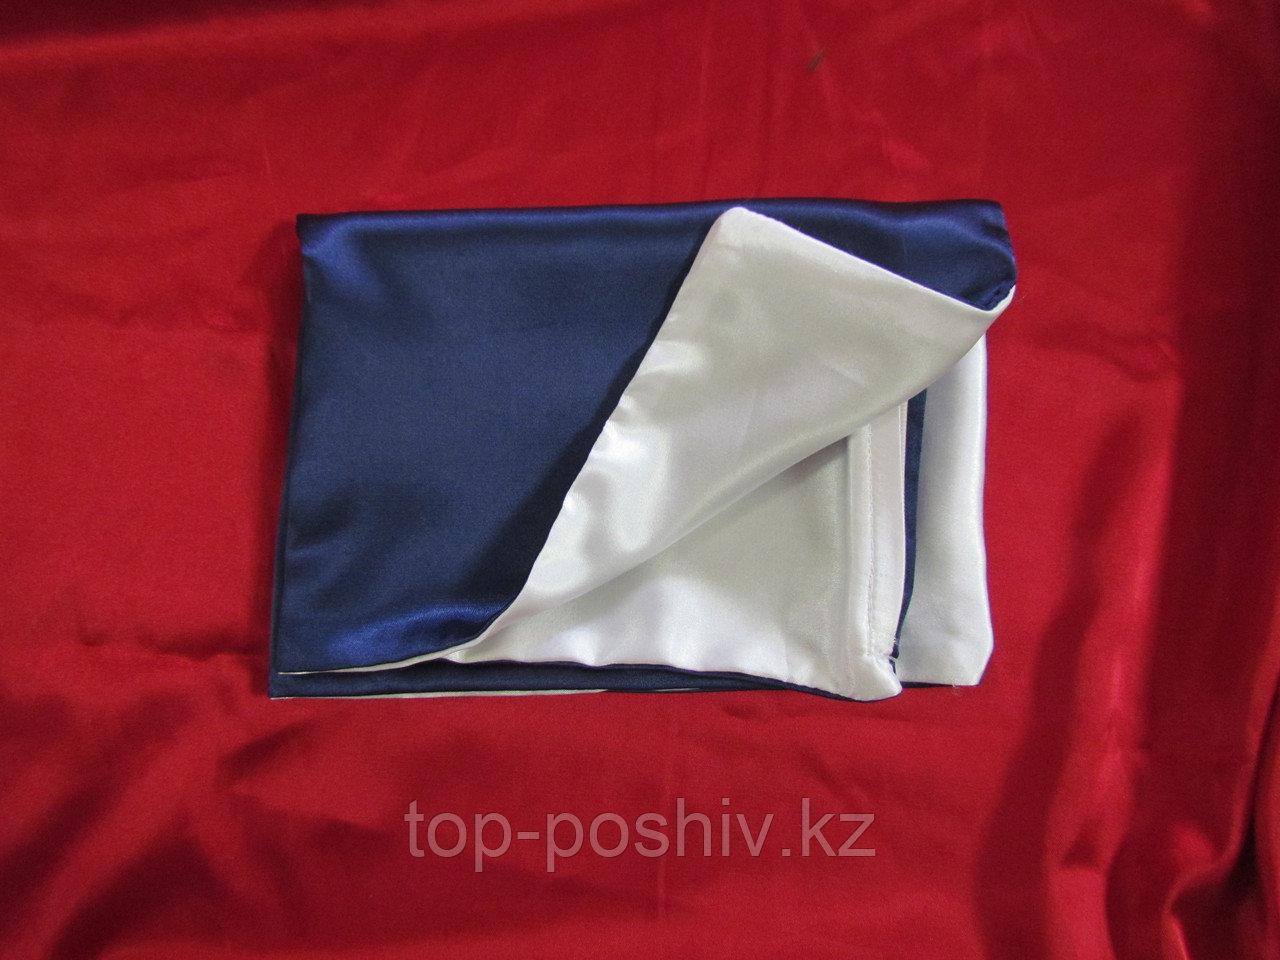 Наволочка двухцветная (бело-синяя) для сублимации, 30х30 см, атлас